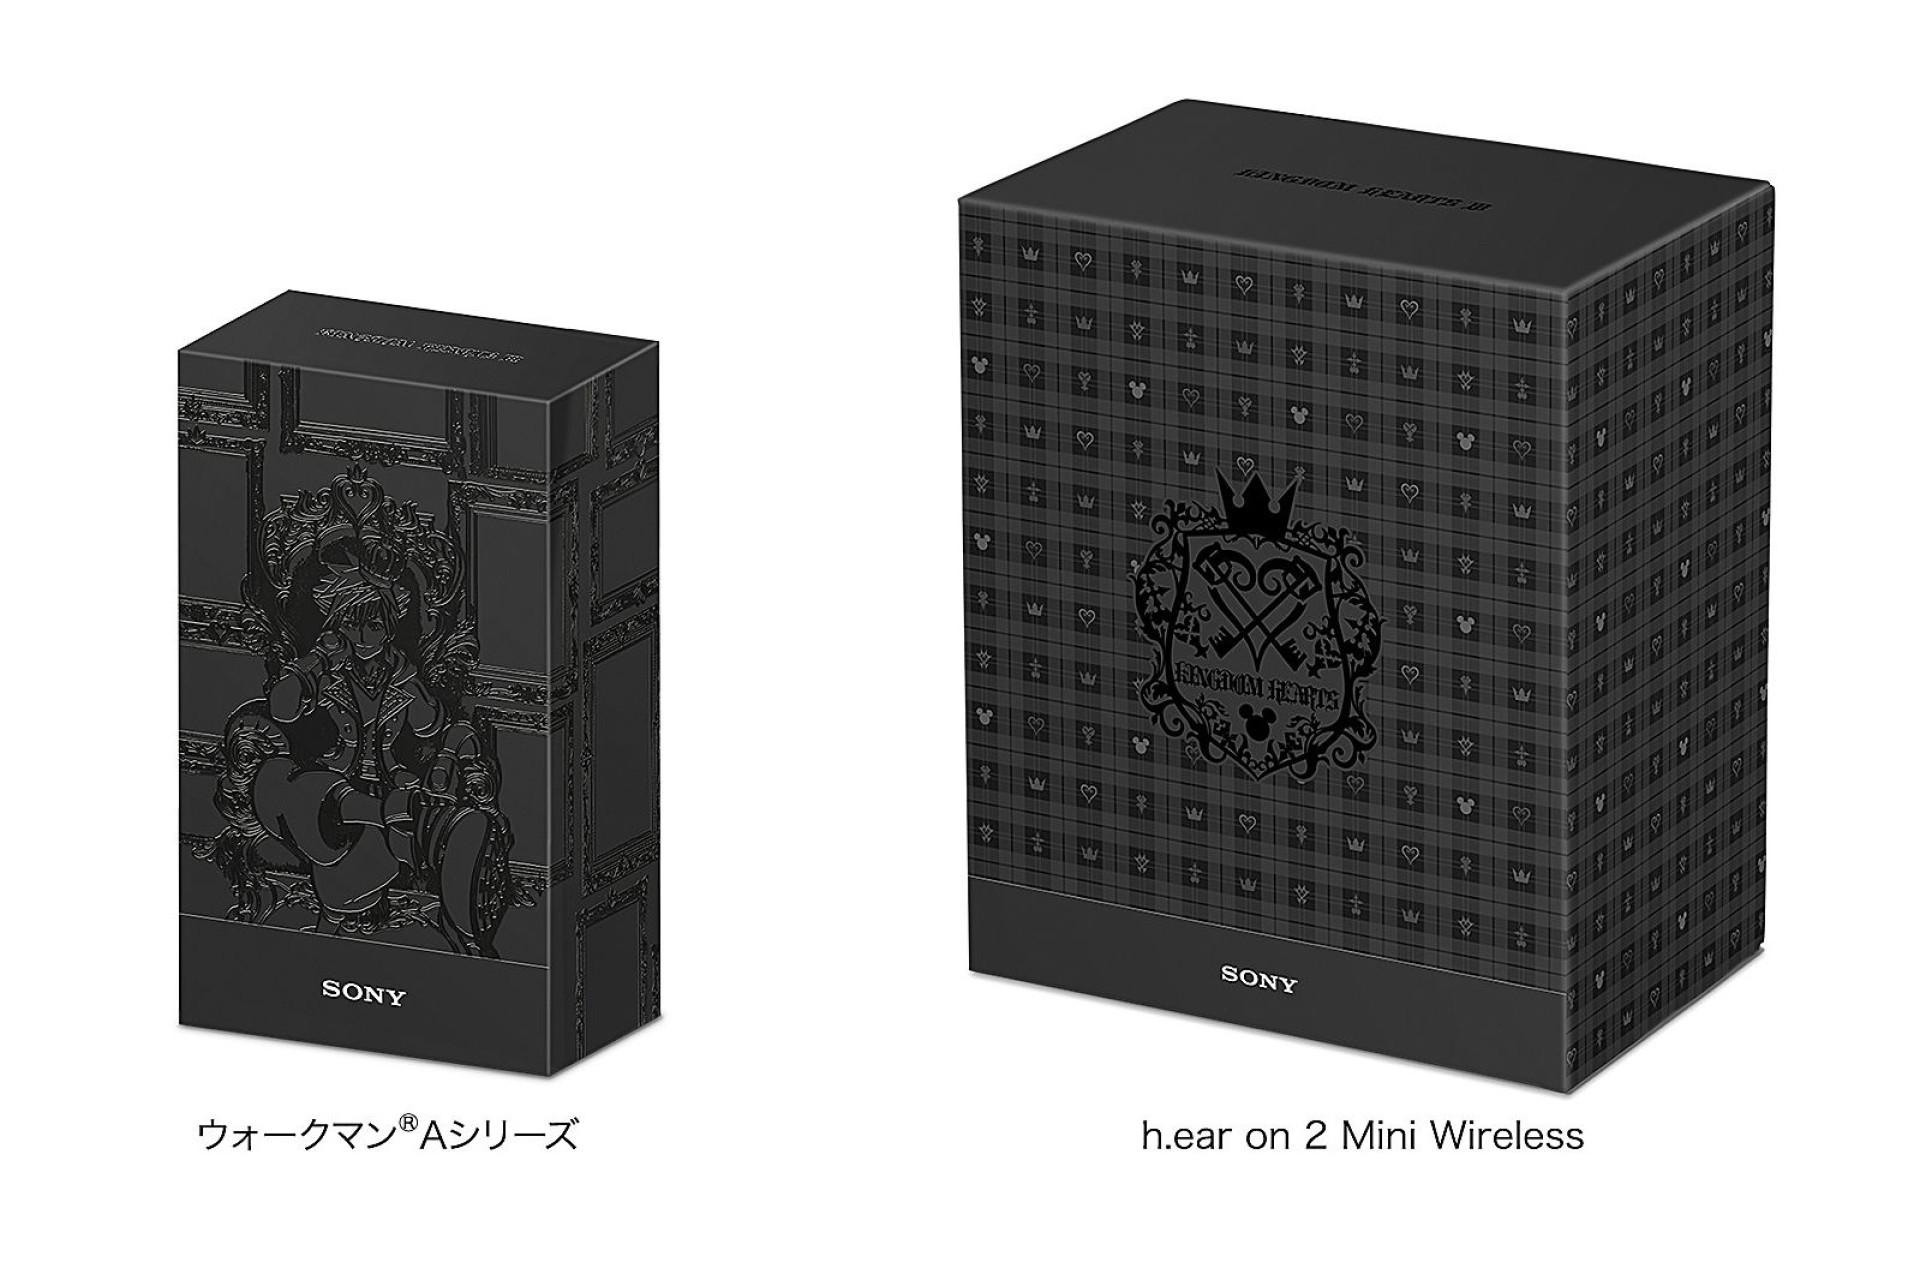 Sony comemora 'Kingdom Hearts III' com Walkman e headphones especiais